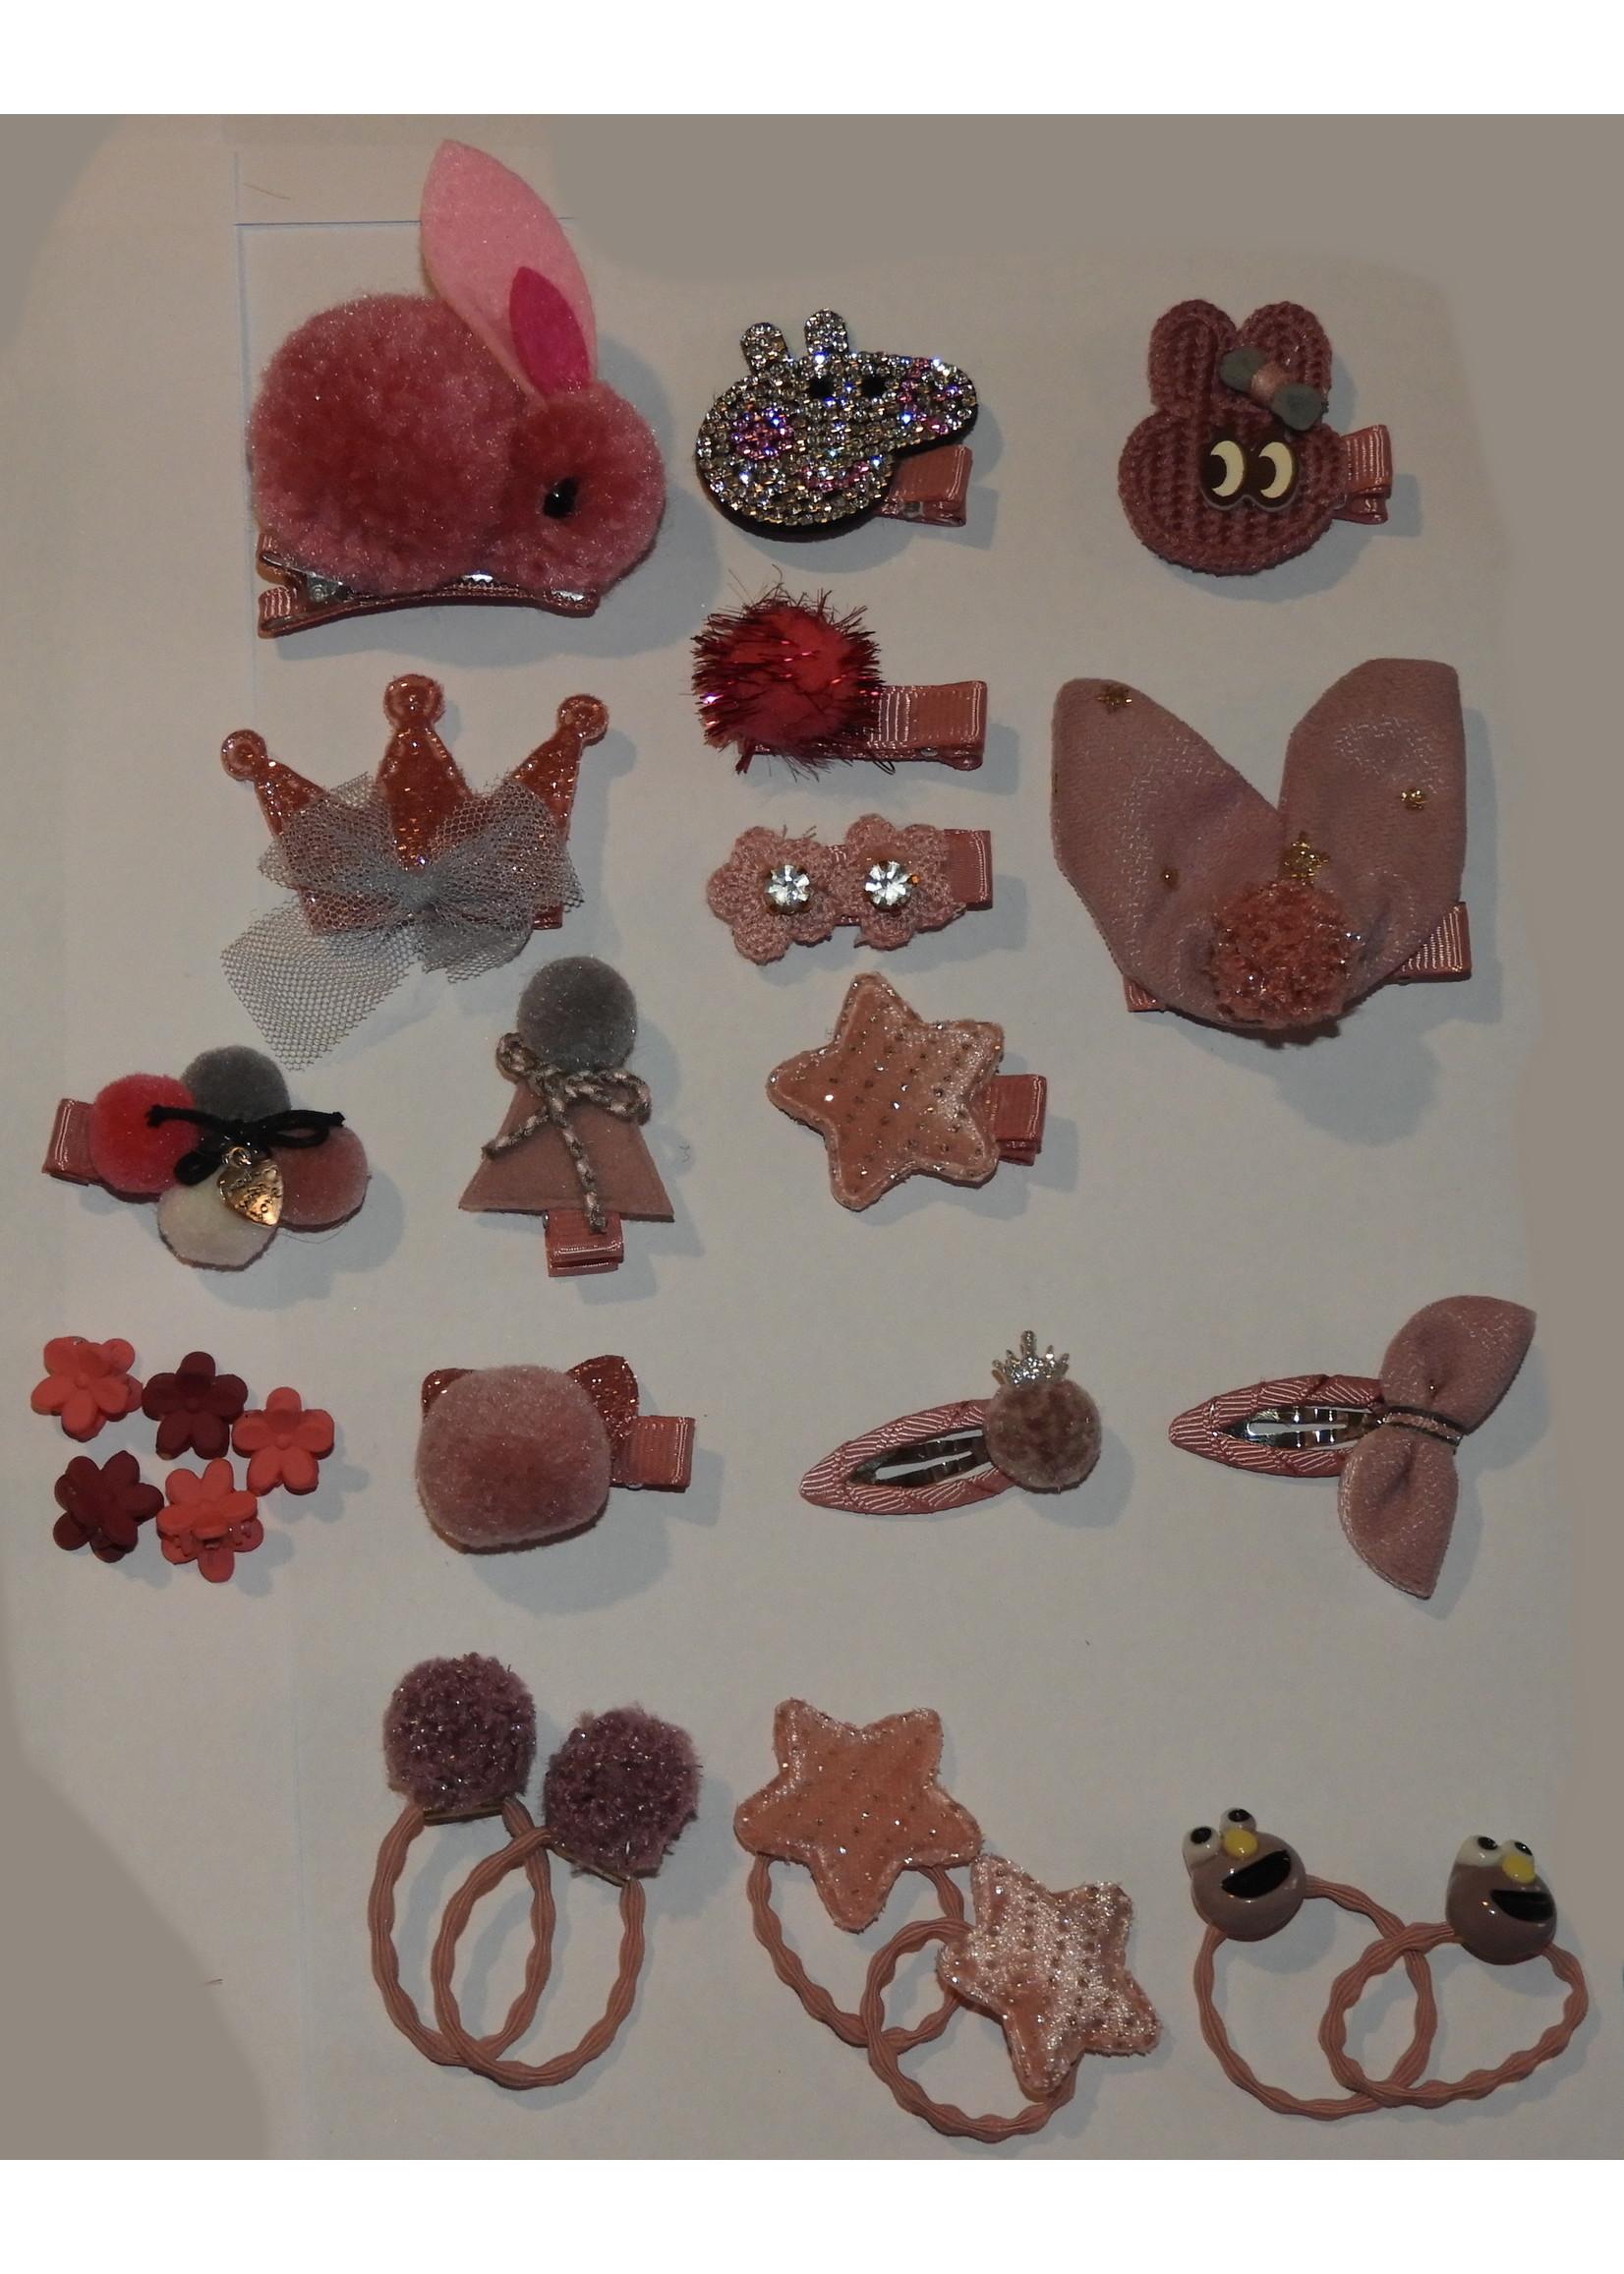 Annienas haar decoratie old pink